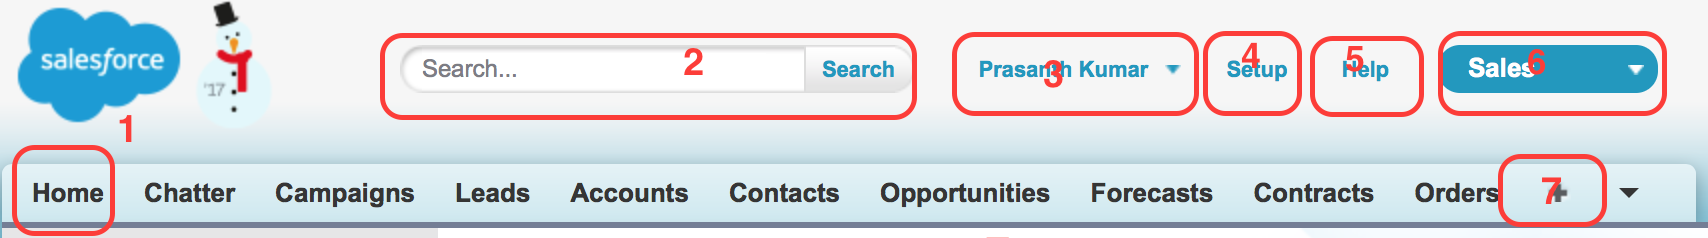 Navigating salesforce.com application